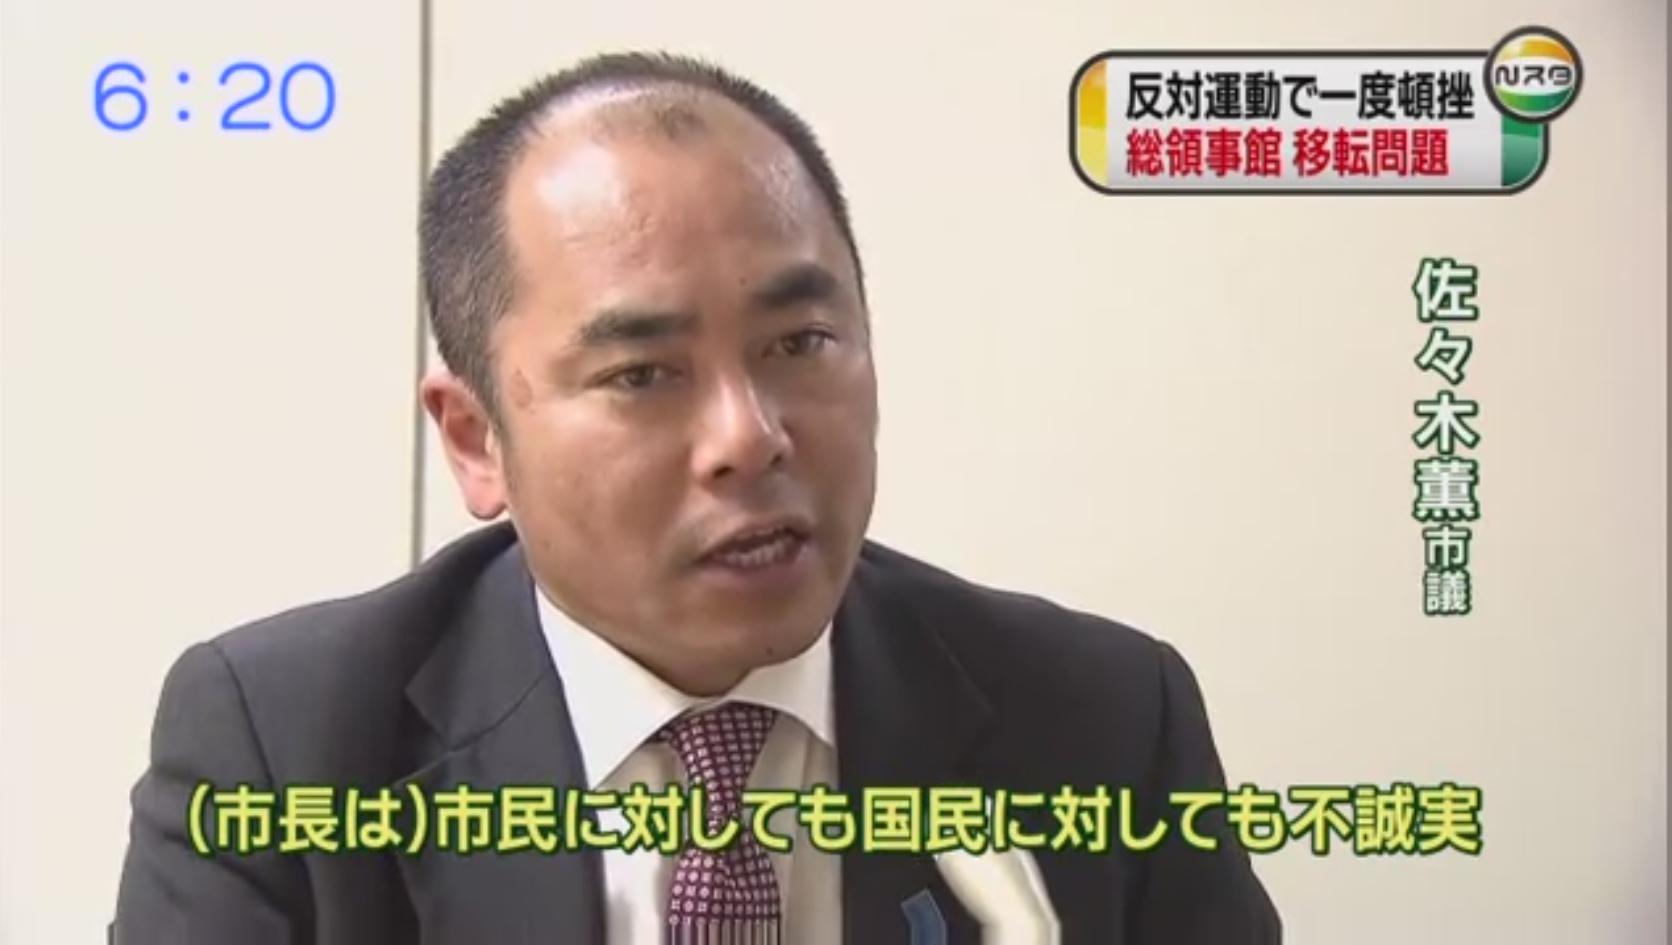 nigata_ryojikan_tv2.jpg